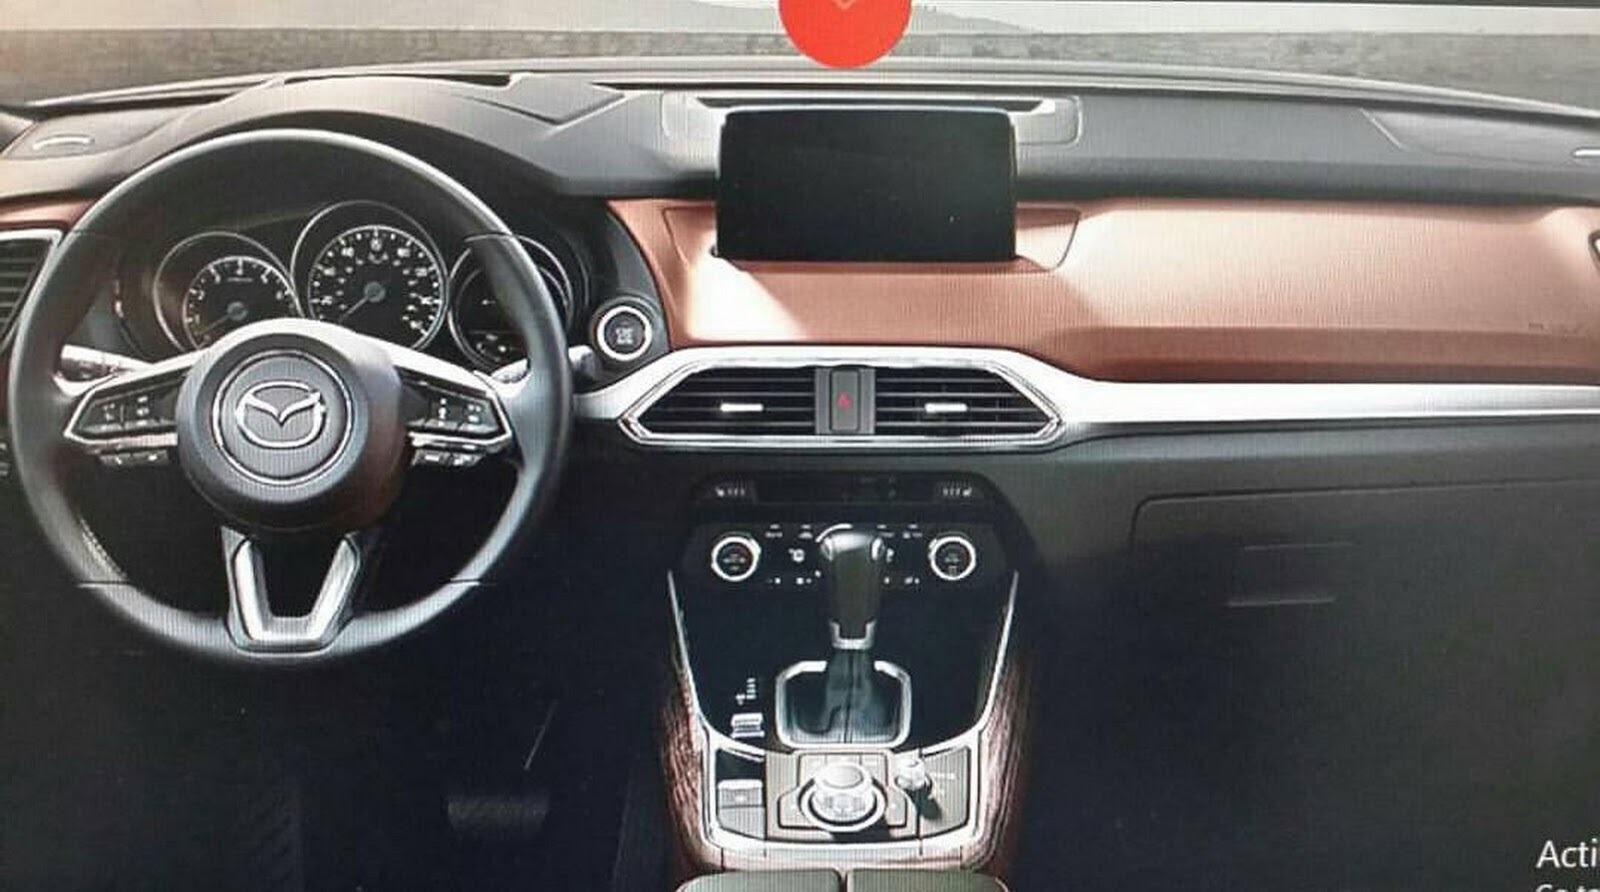 Foto de Mazda CX-9 2016 (filtraciones) (3/4)